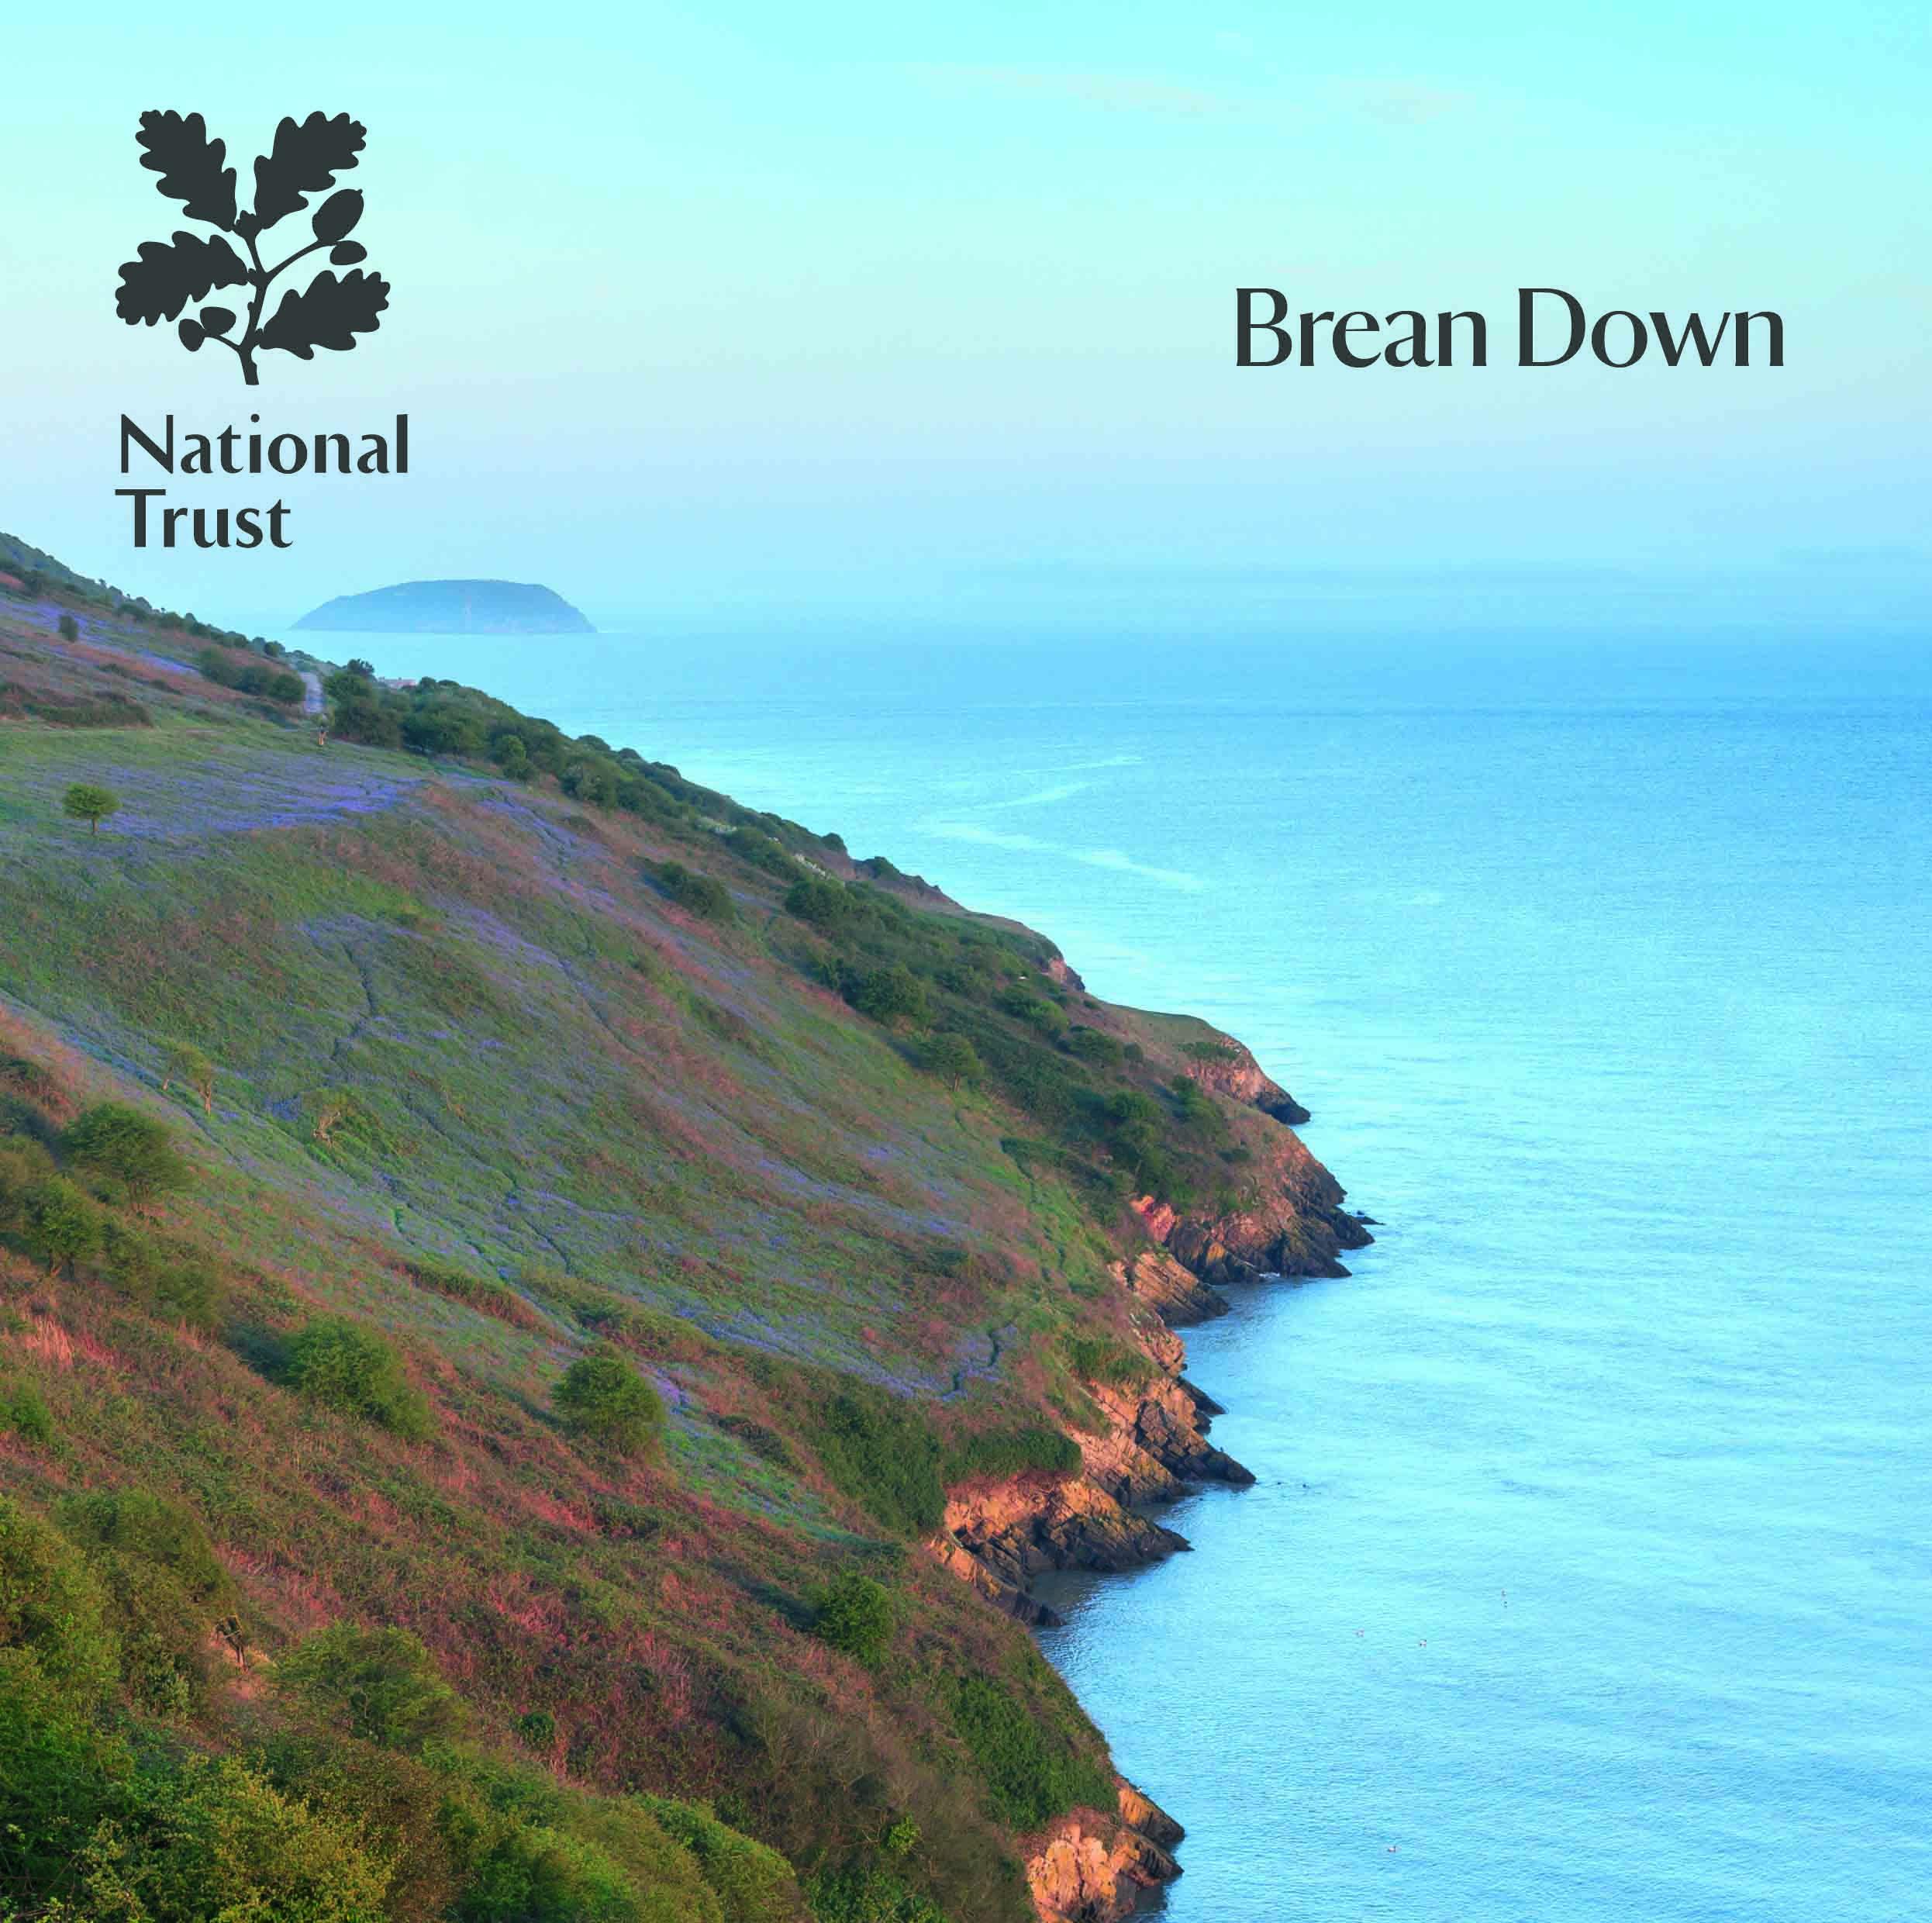 Brean Down